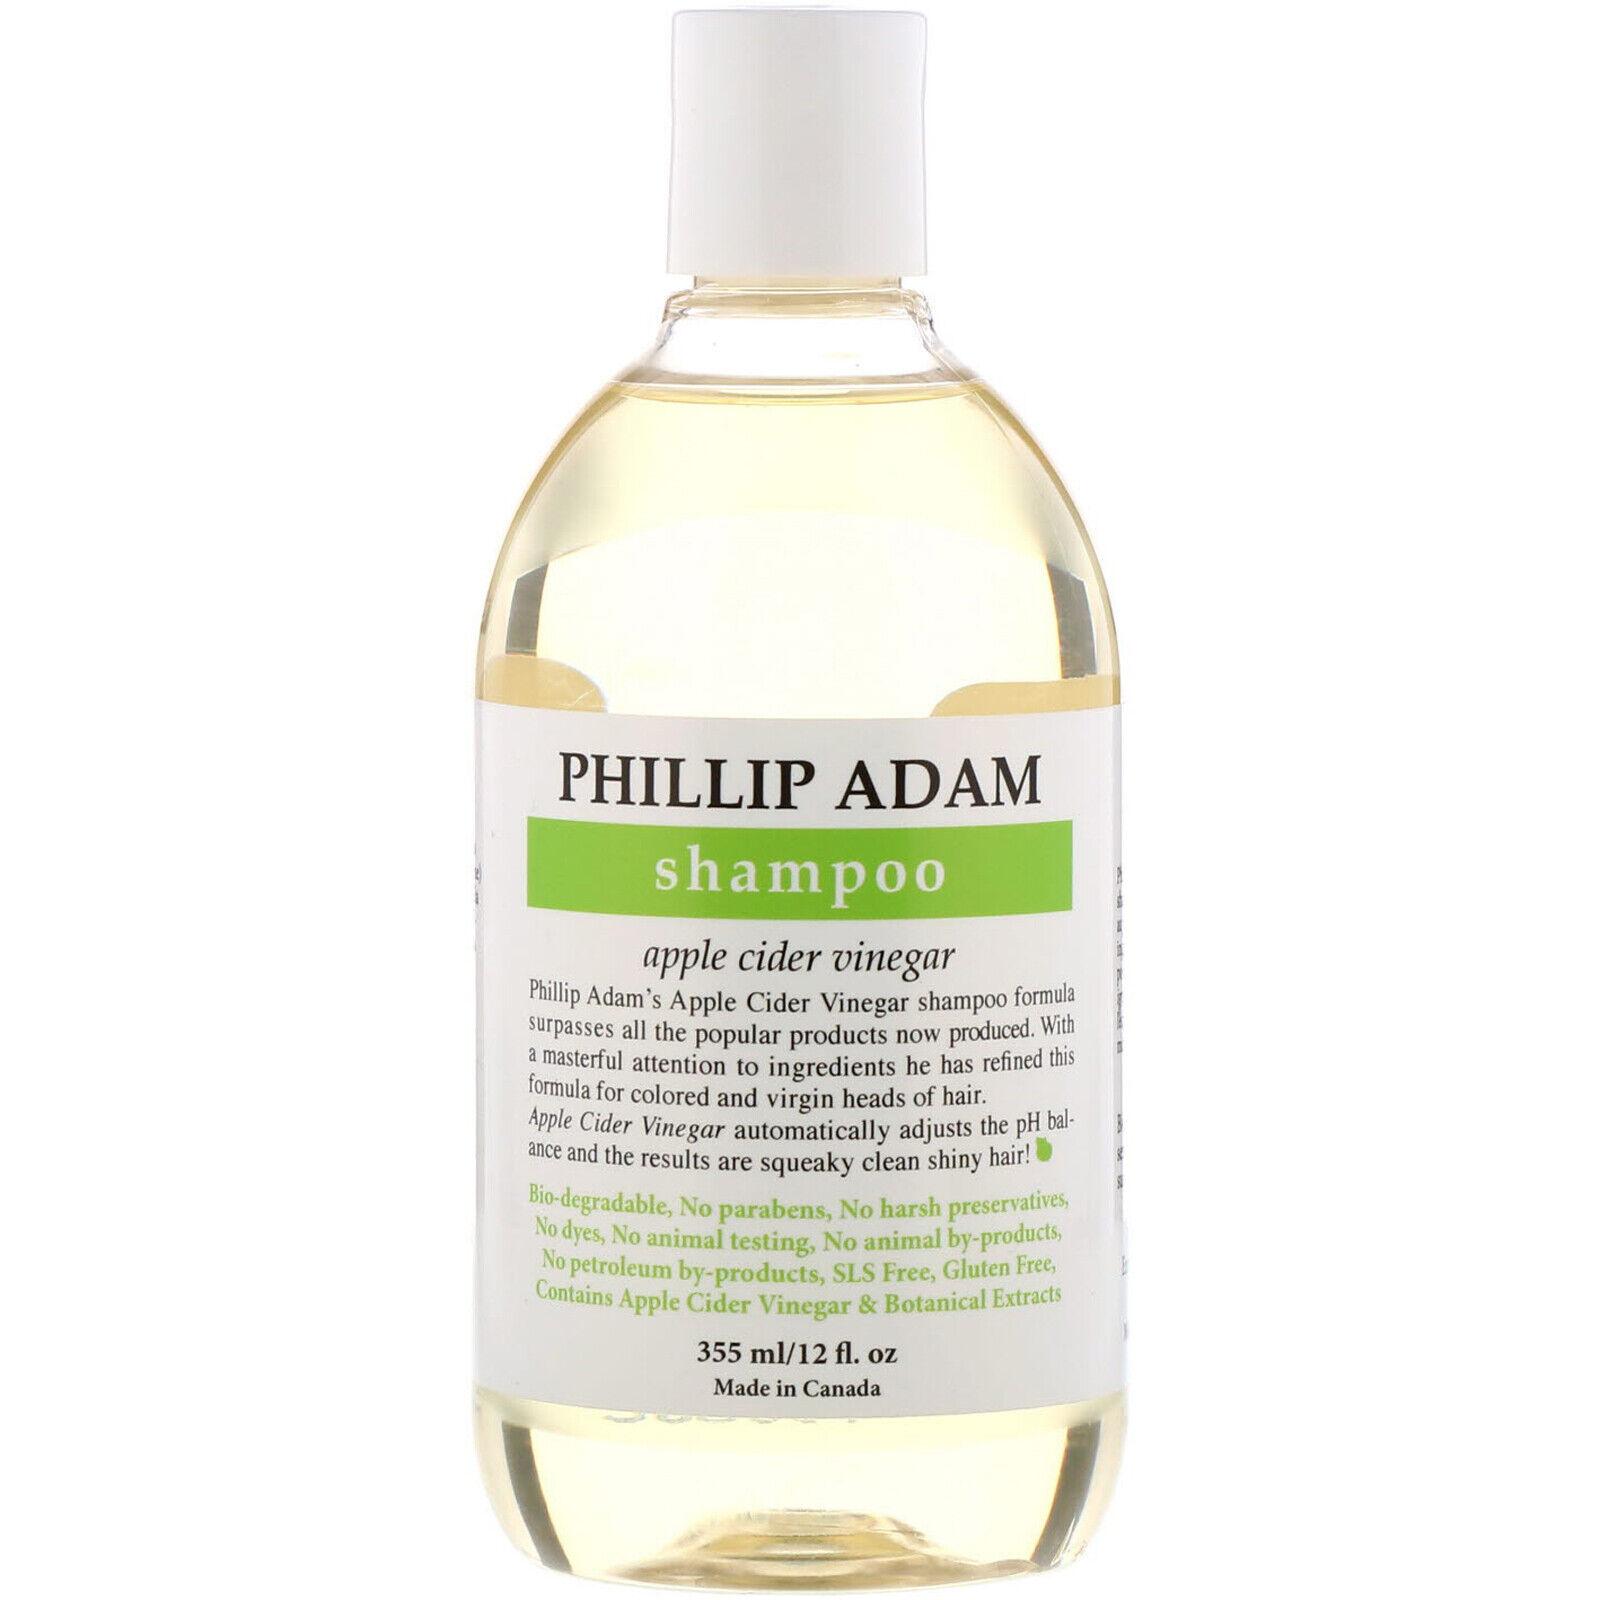 Phillip Adam Shampoo Apple Cider Vinegar 12 Oz For Sale Online Ebay